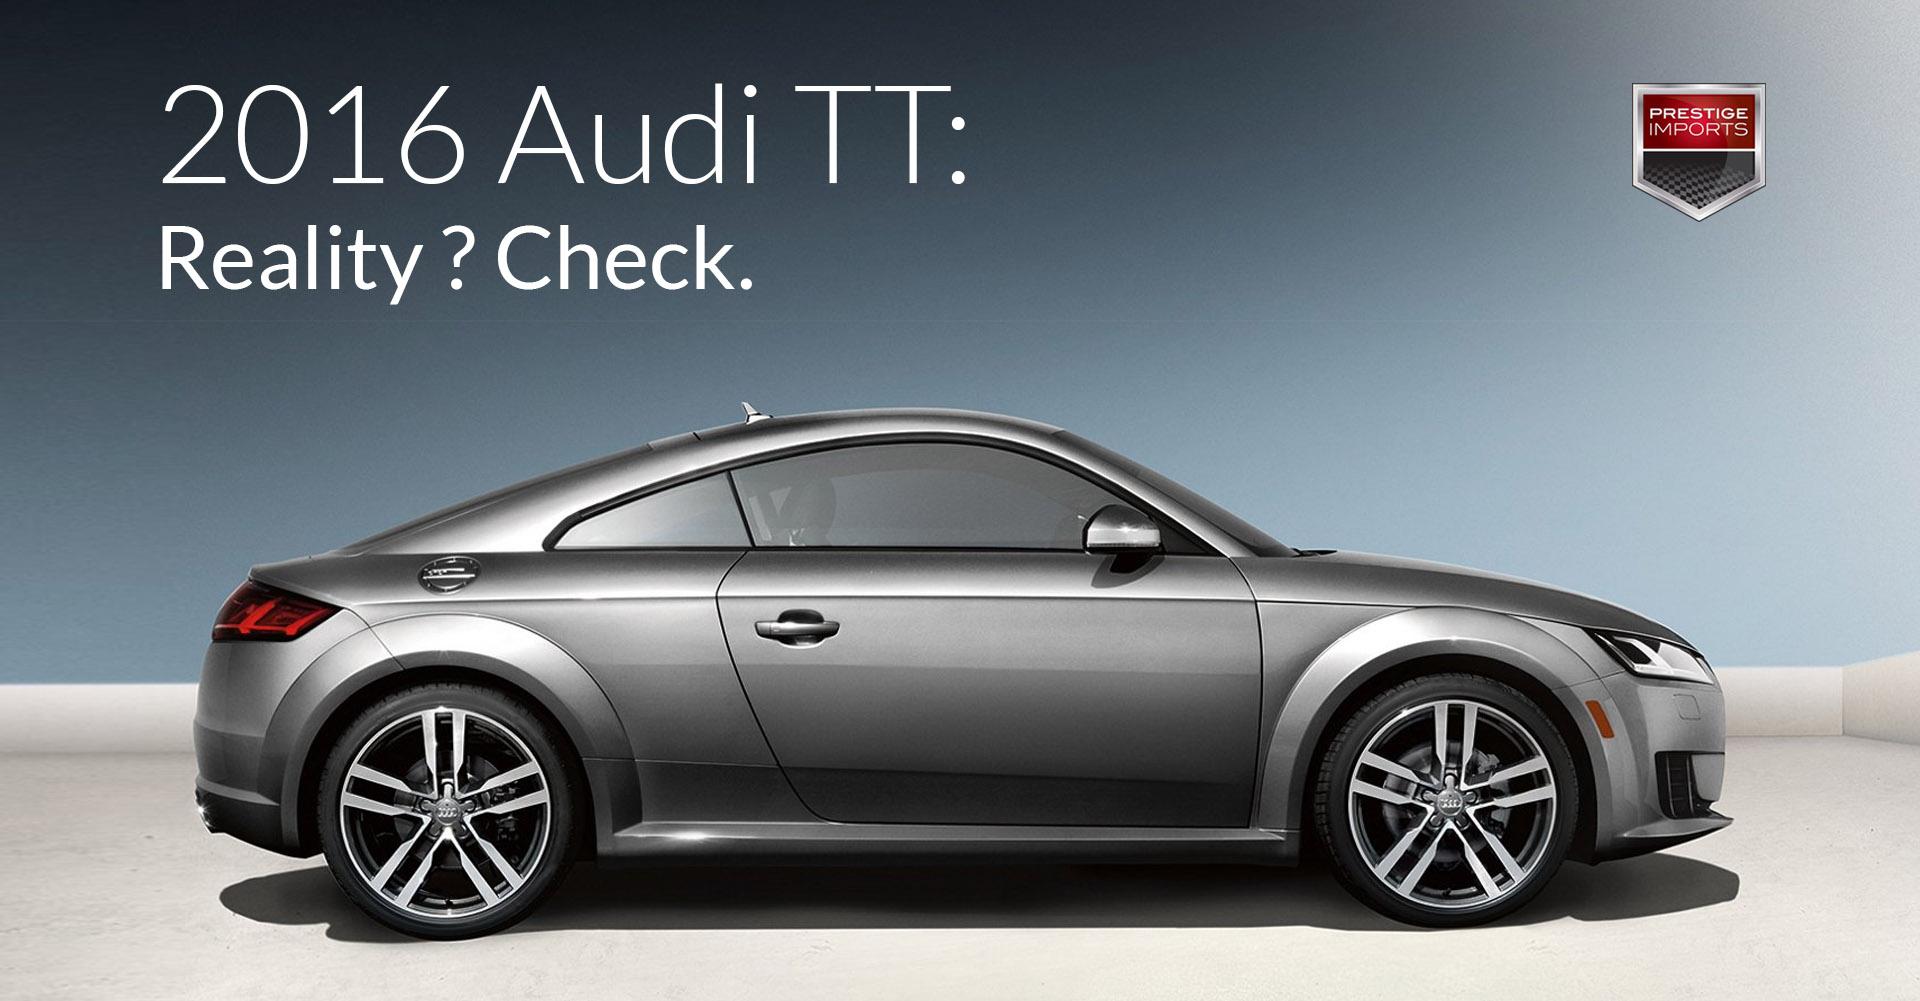 2016 Audi TT - Reality? Check.